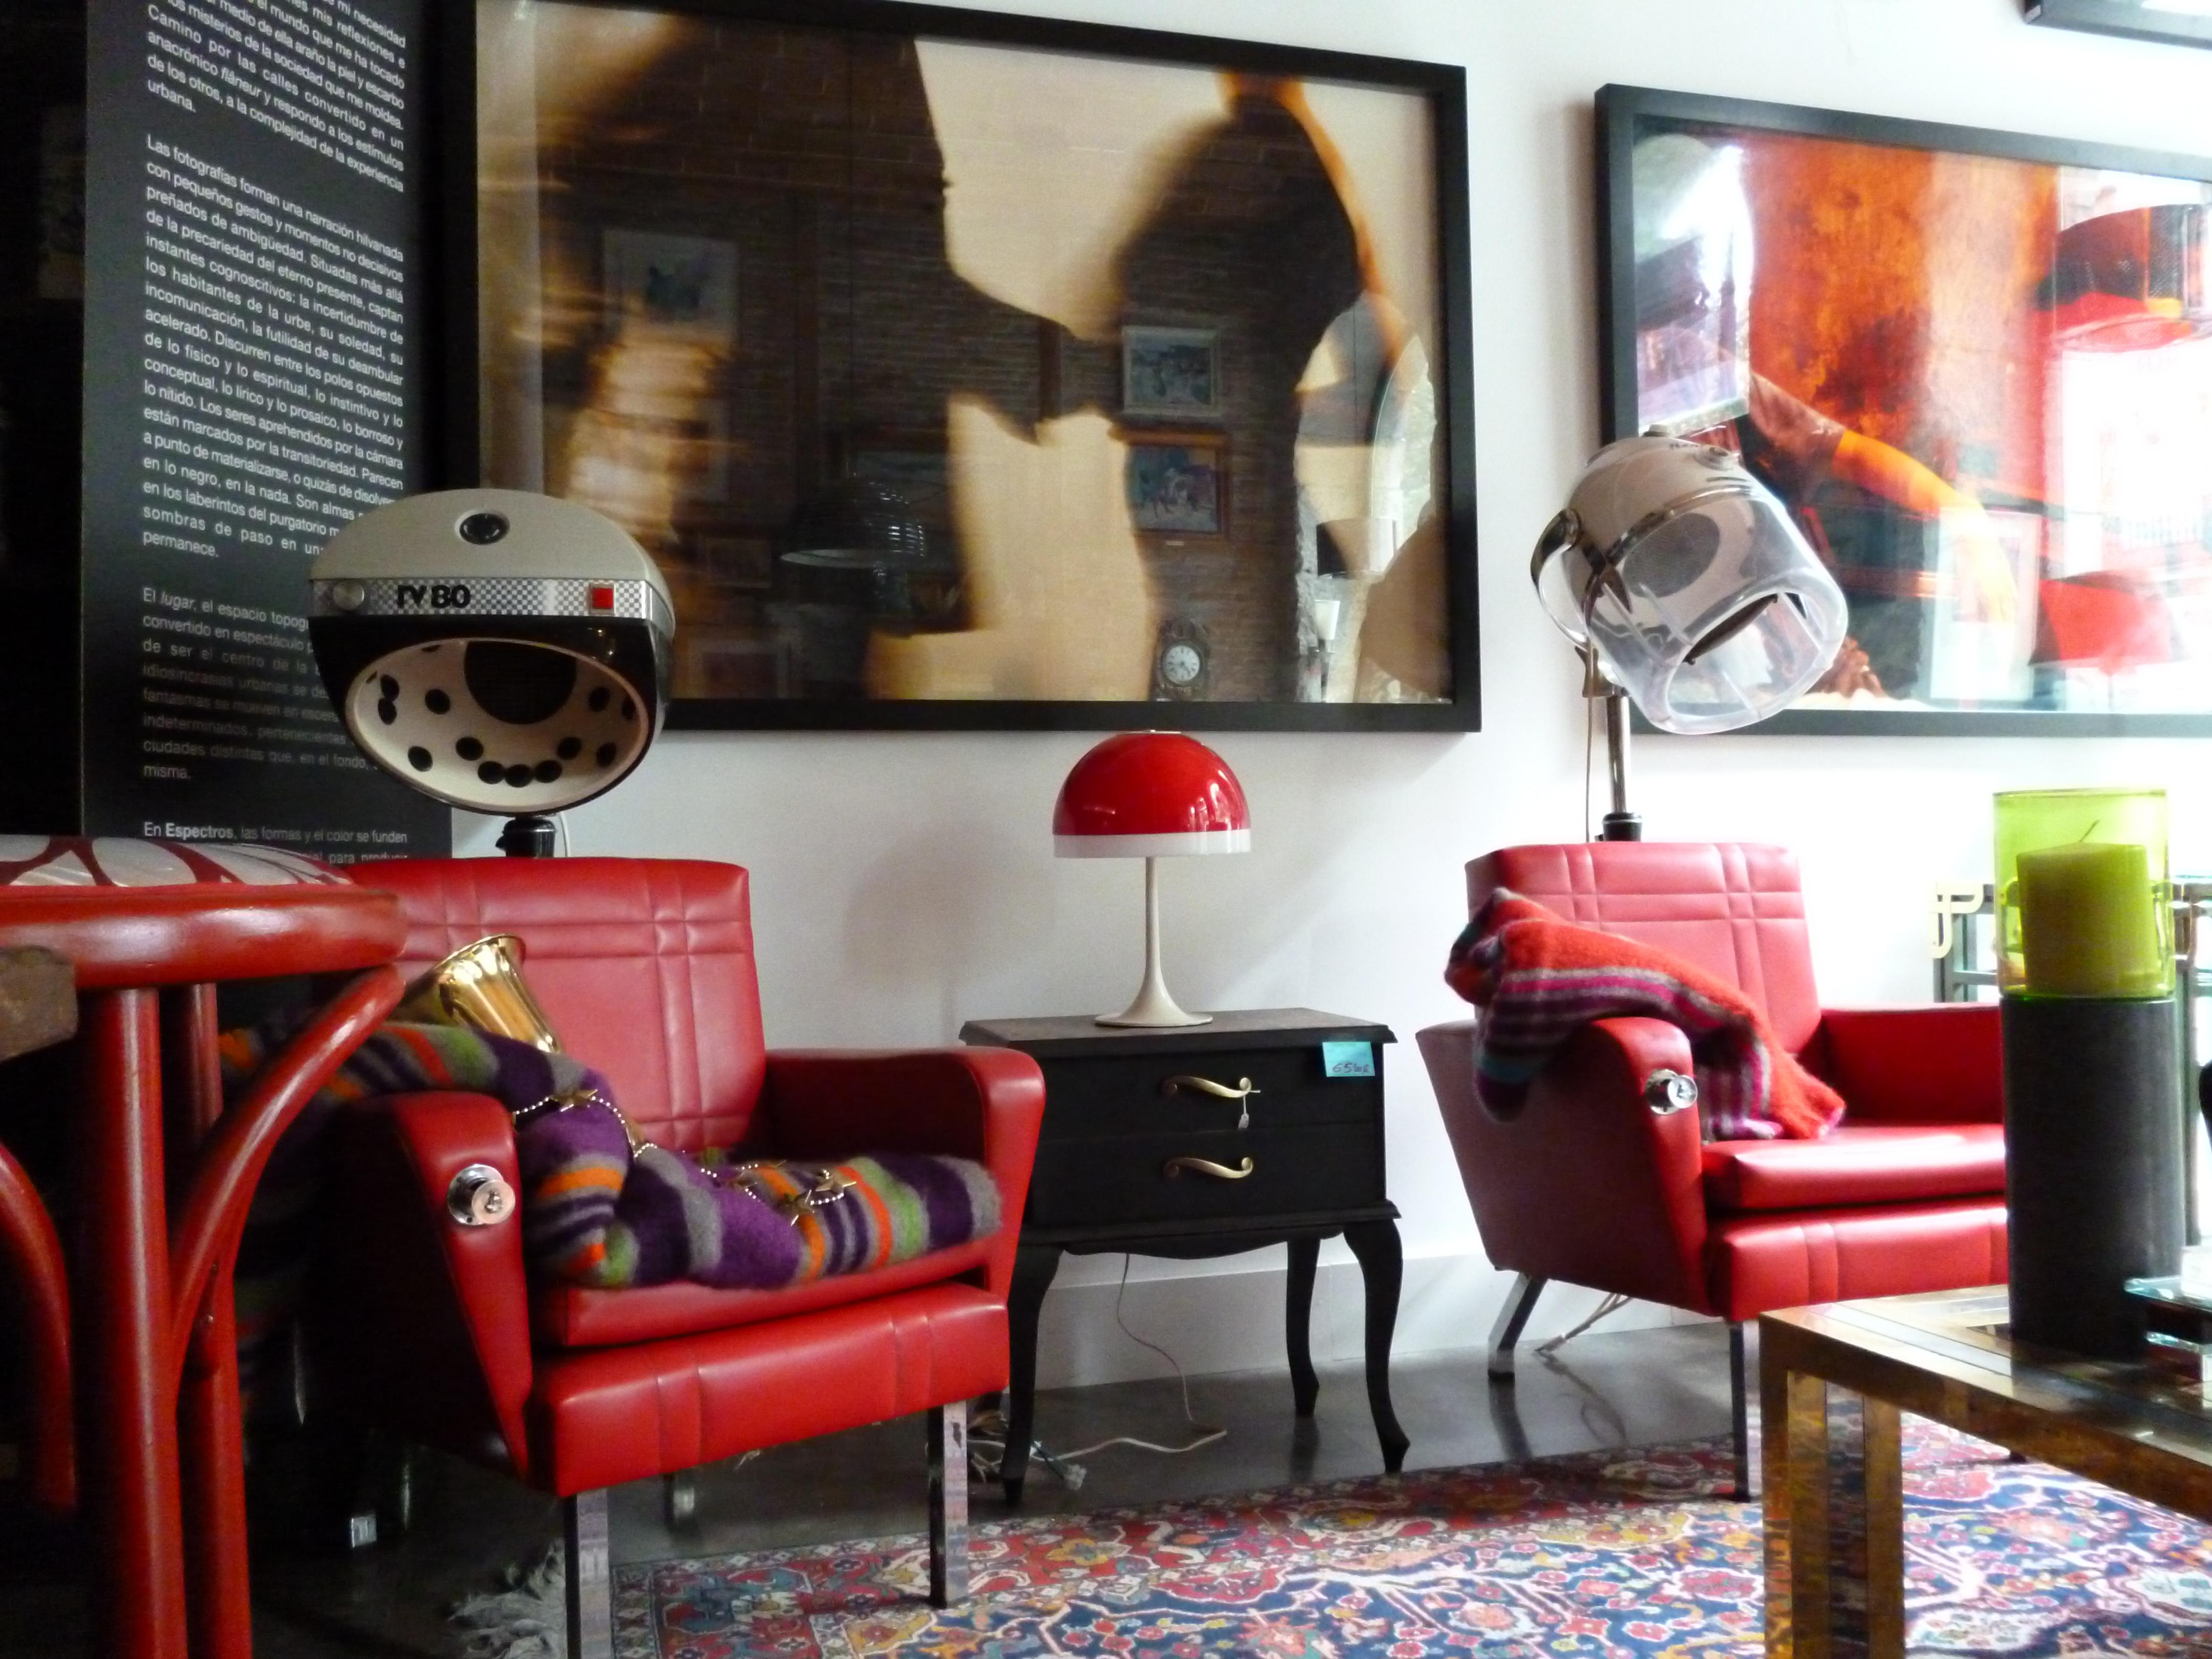 Vintage muebles iluminacion objetos mobiliario for Vintage muebles y objetos